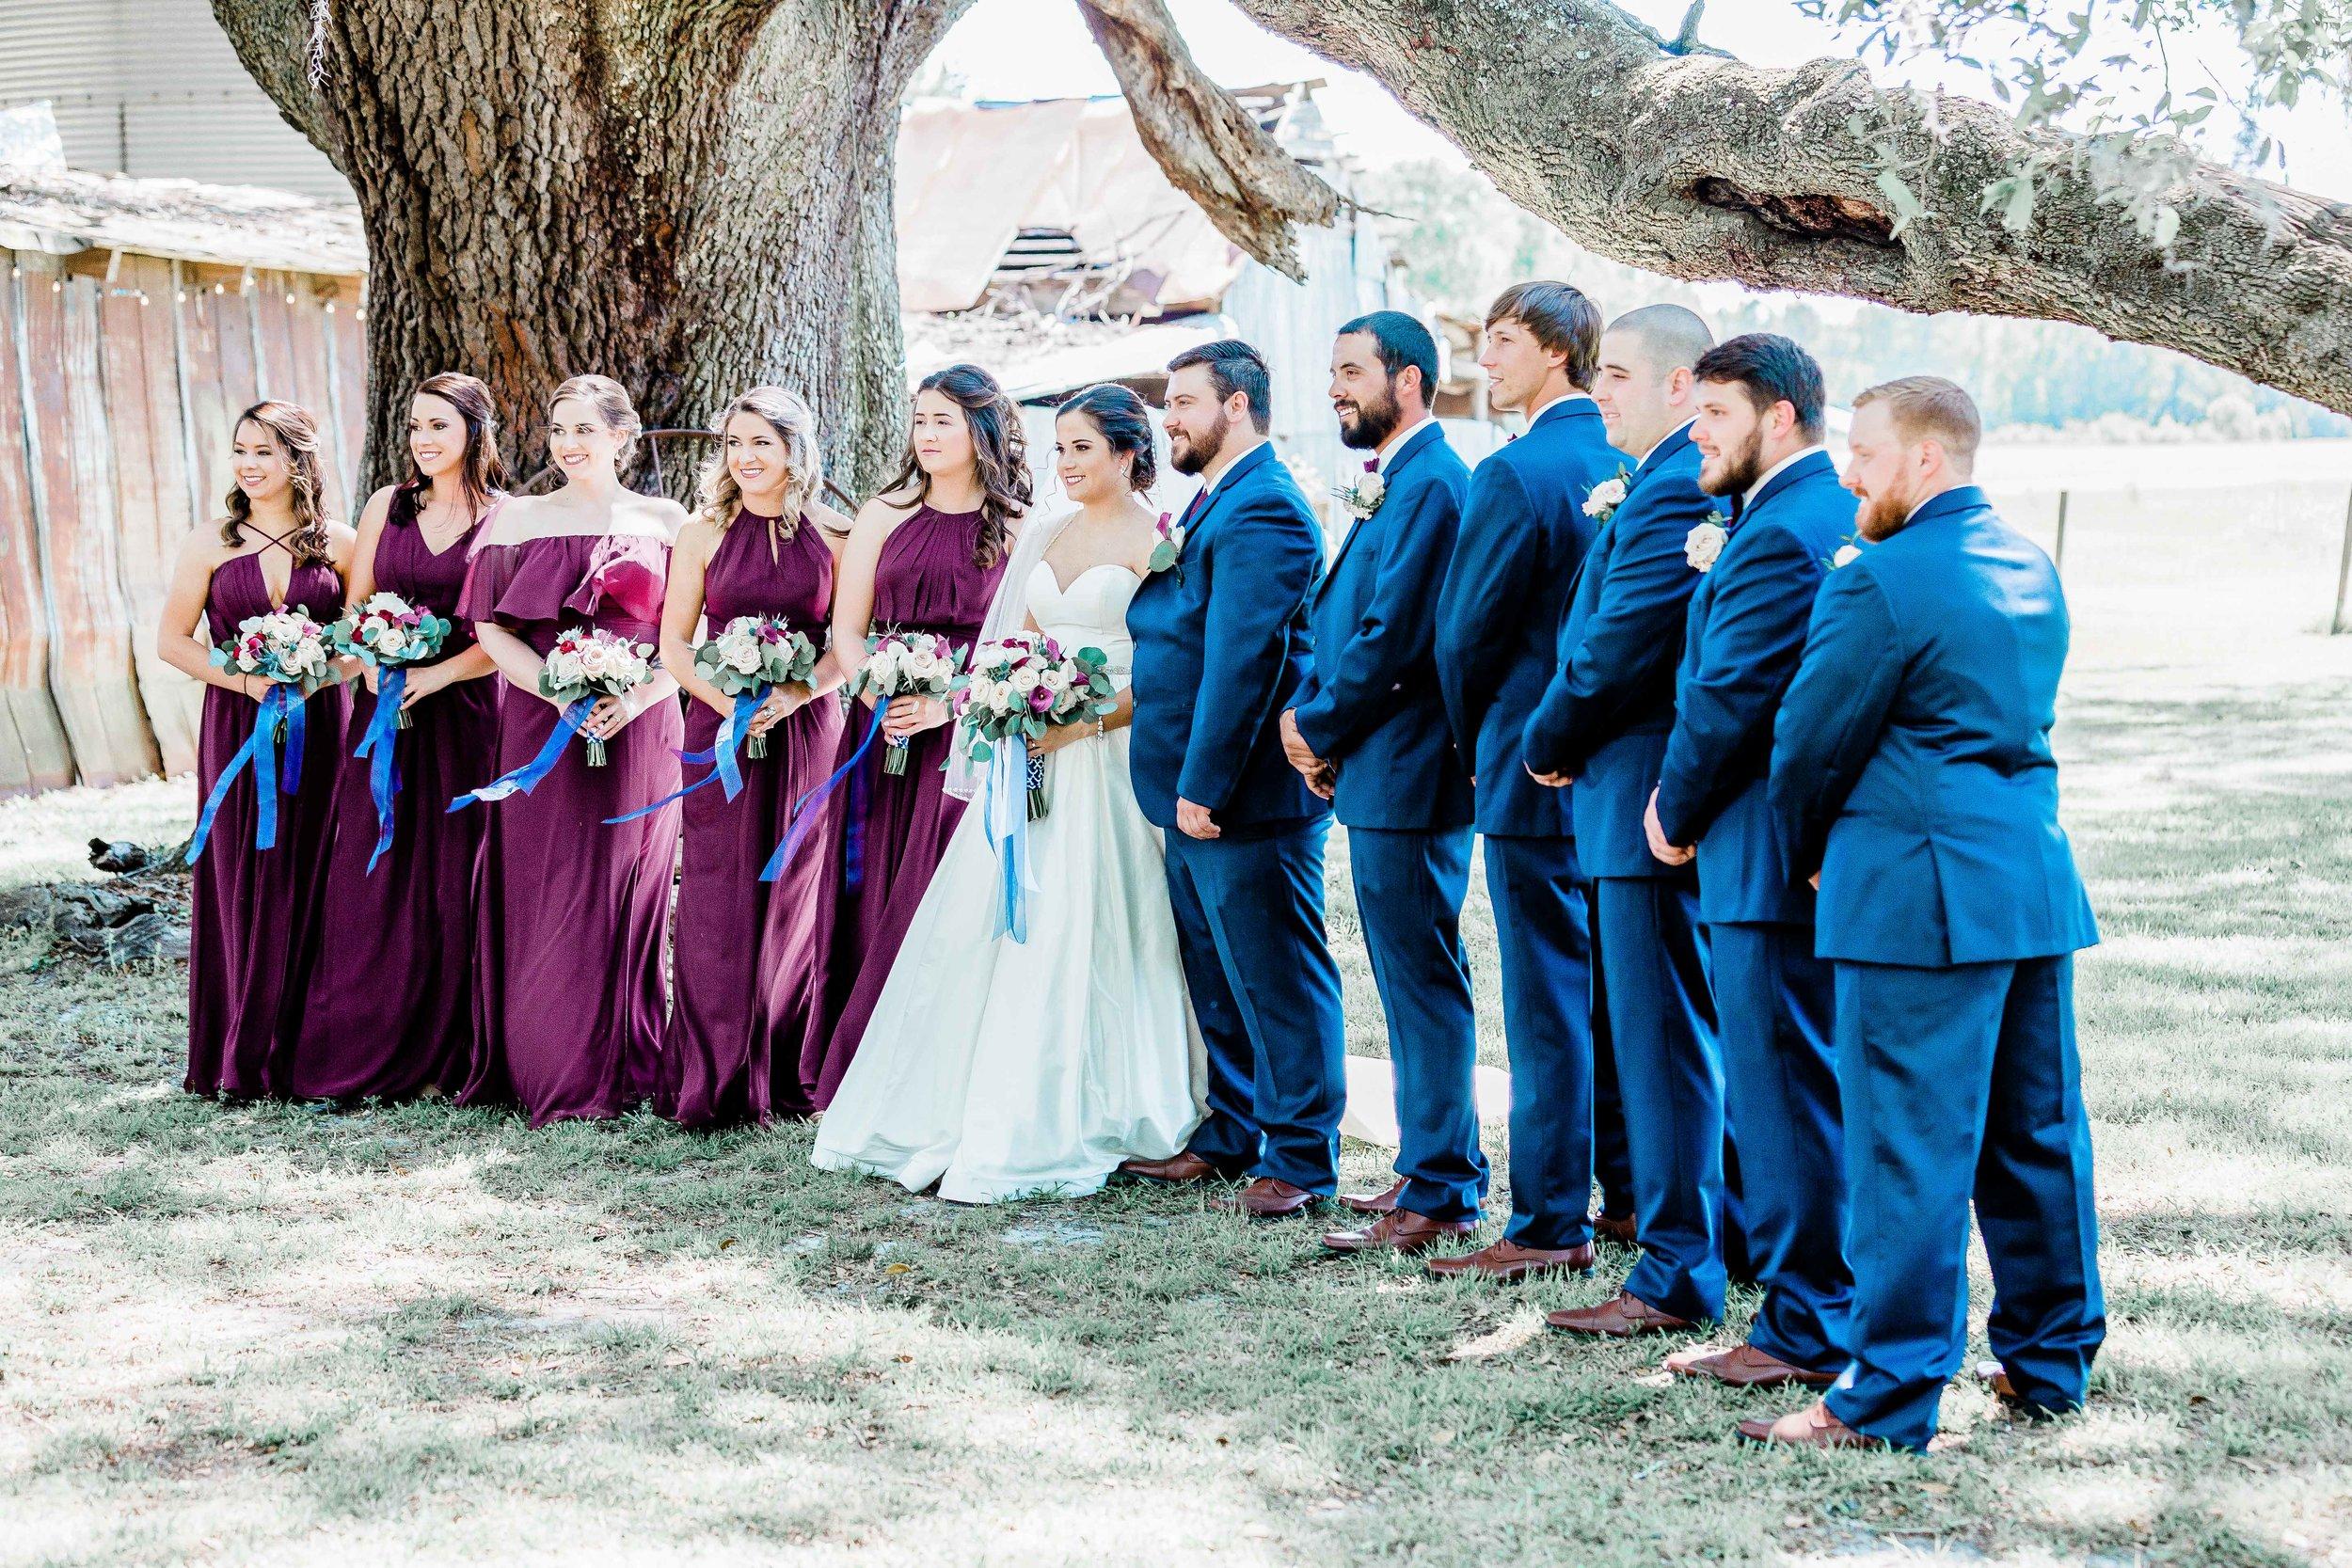 20190427-Southern Lens Photography- Savannah Wedding Photographer-Screven and Caroline-201959.jpg